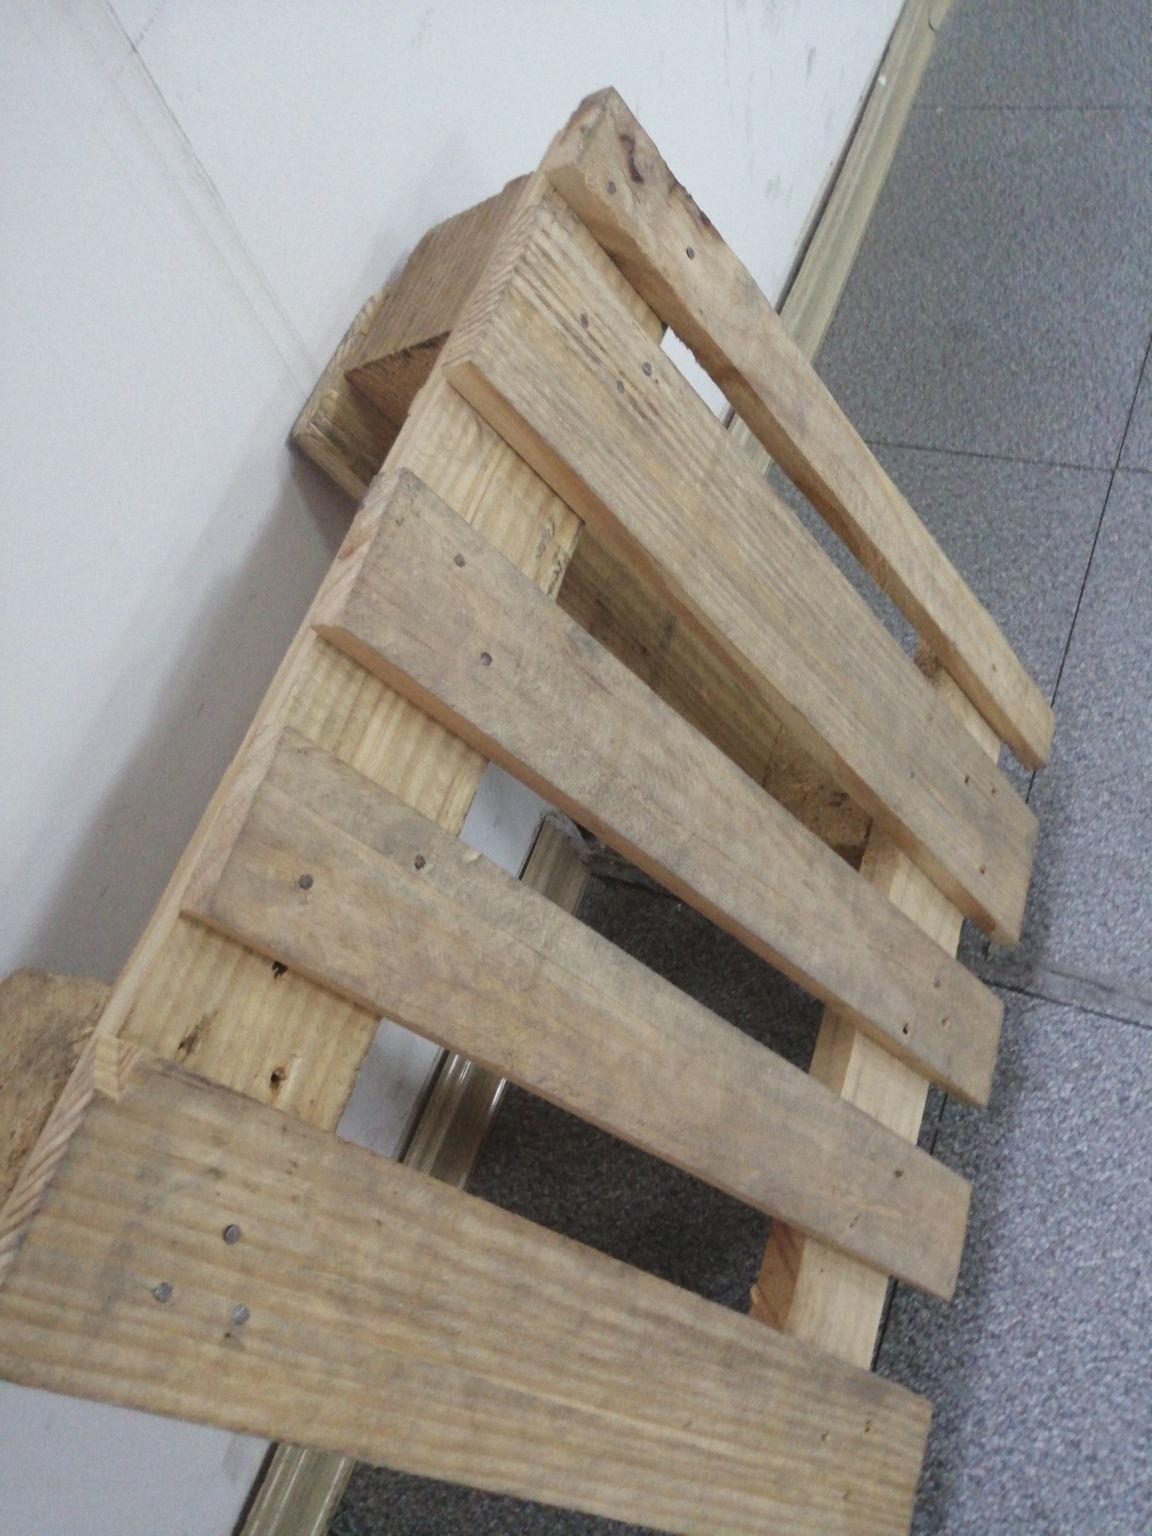 a-30松木家具-a-30松木家具批发、促销价�,❀=¯卐、产地货源